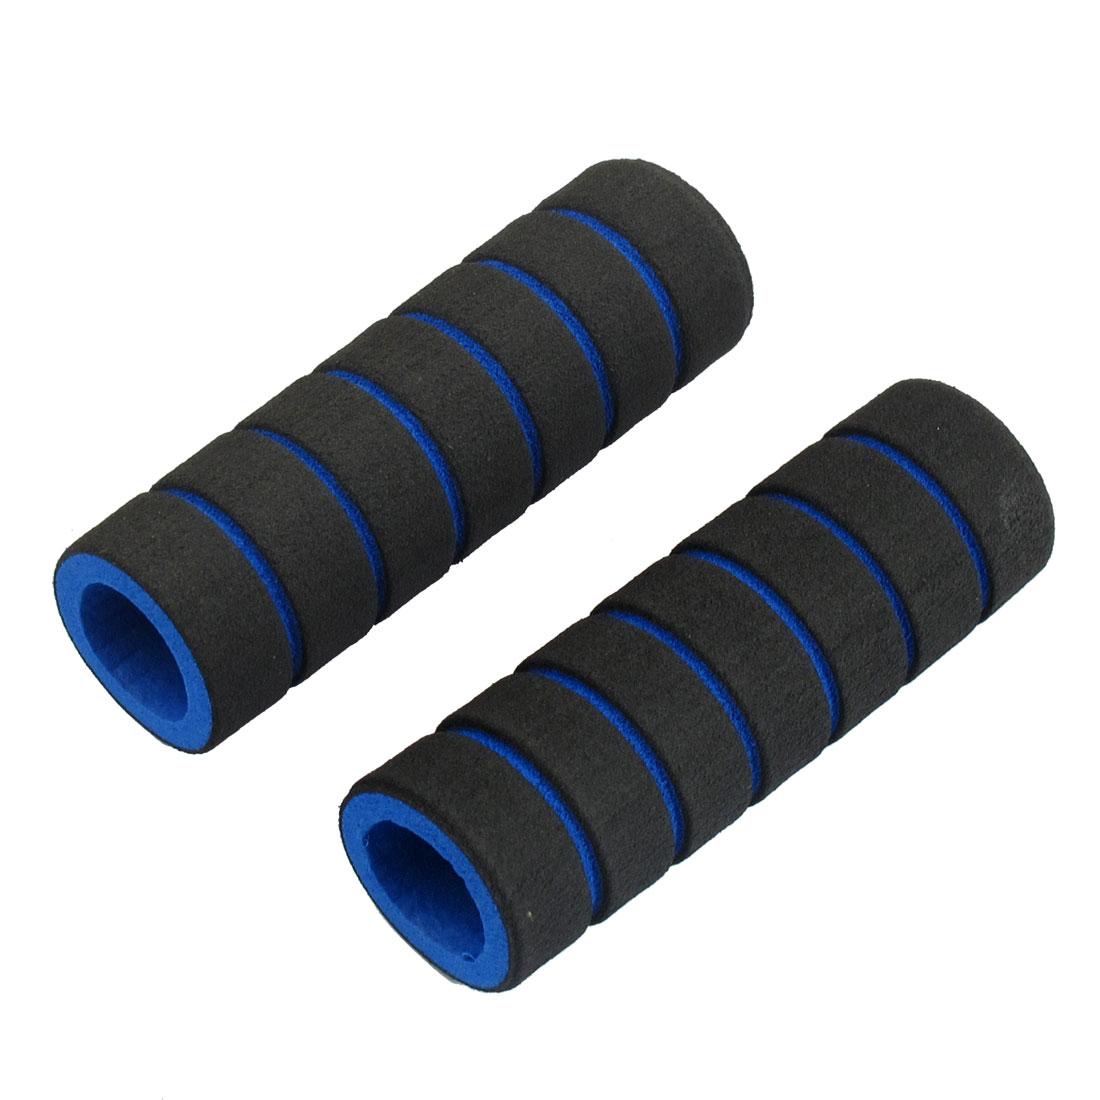 2 Pcs Striped Nonslip Cycling Bike Handlebar Grip Cover Black Blue